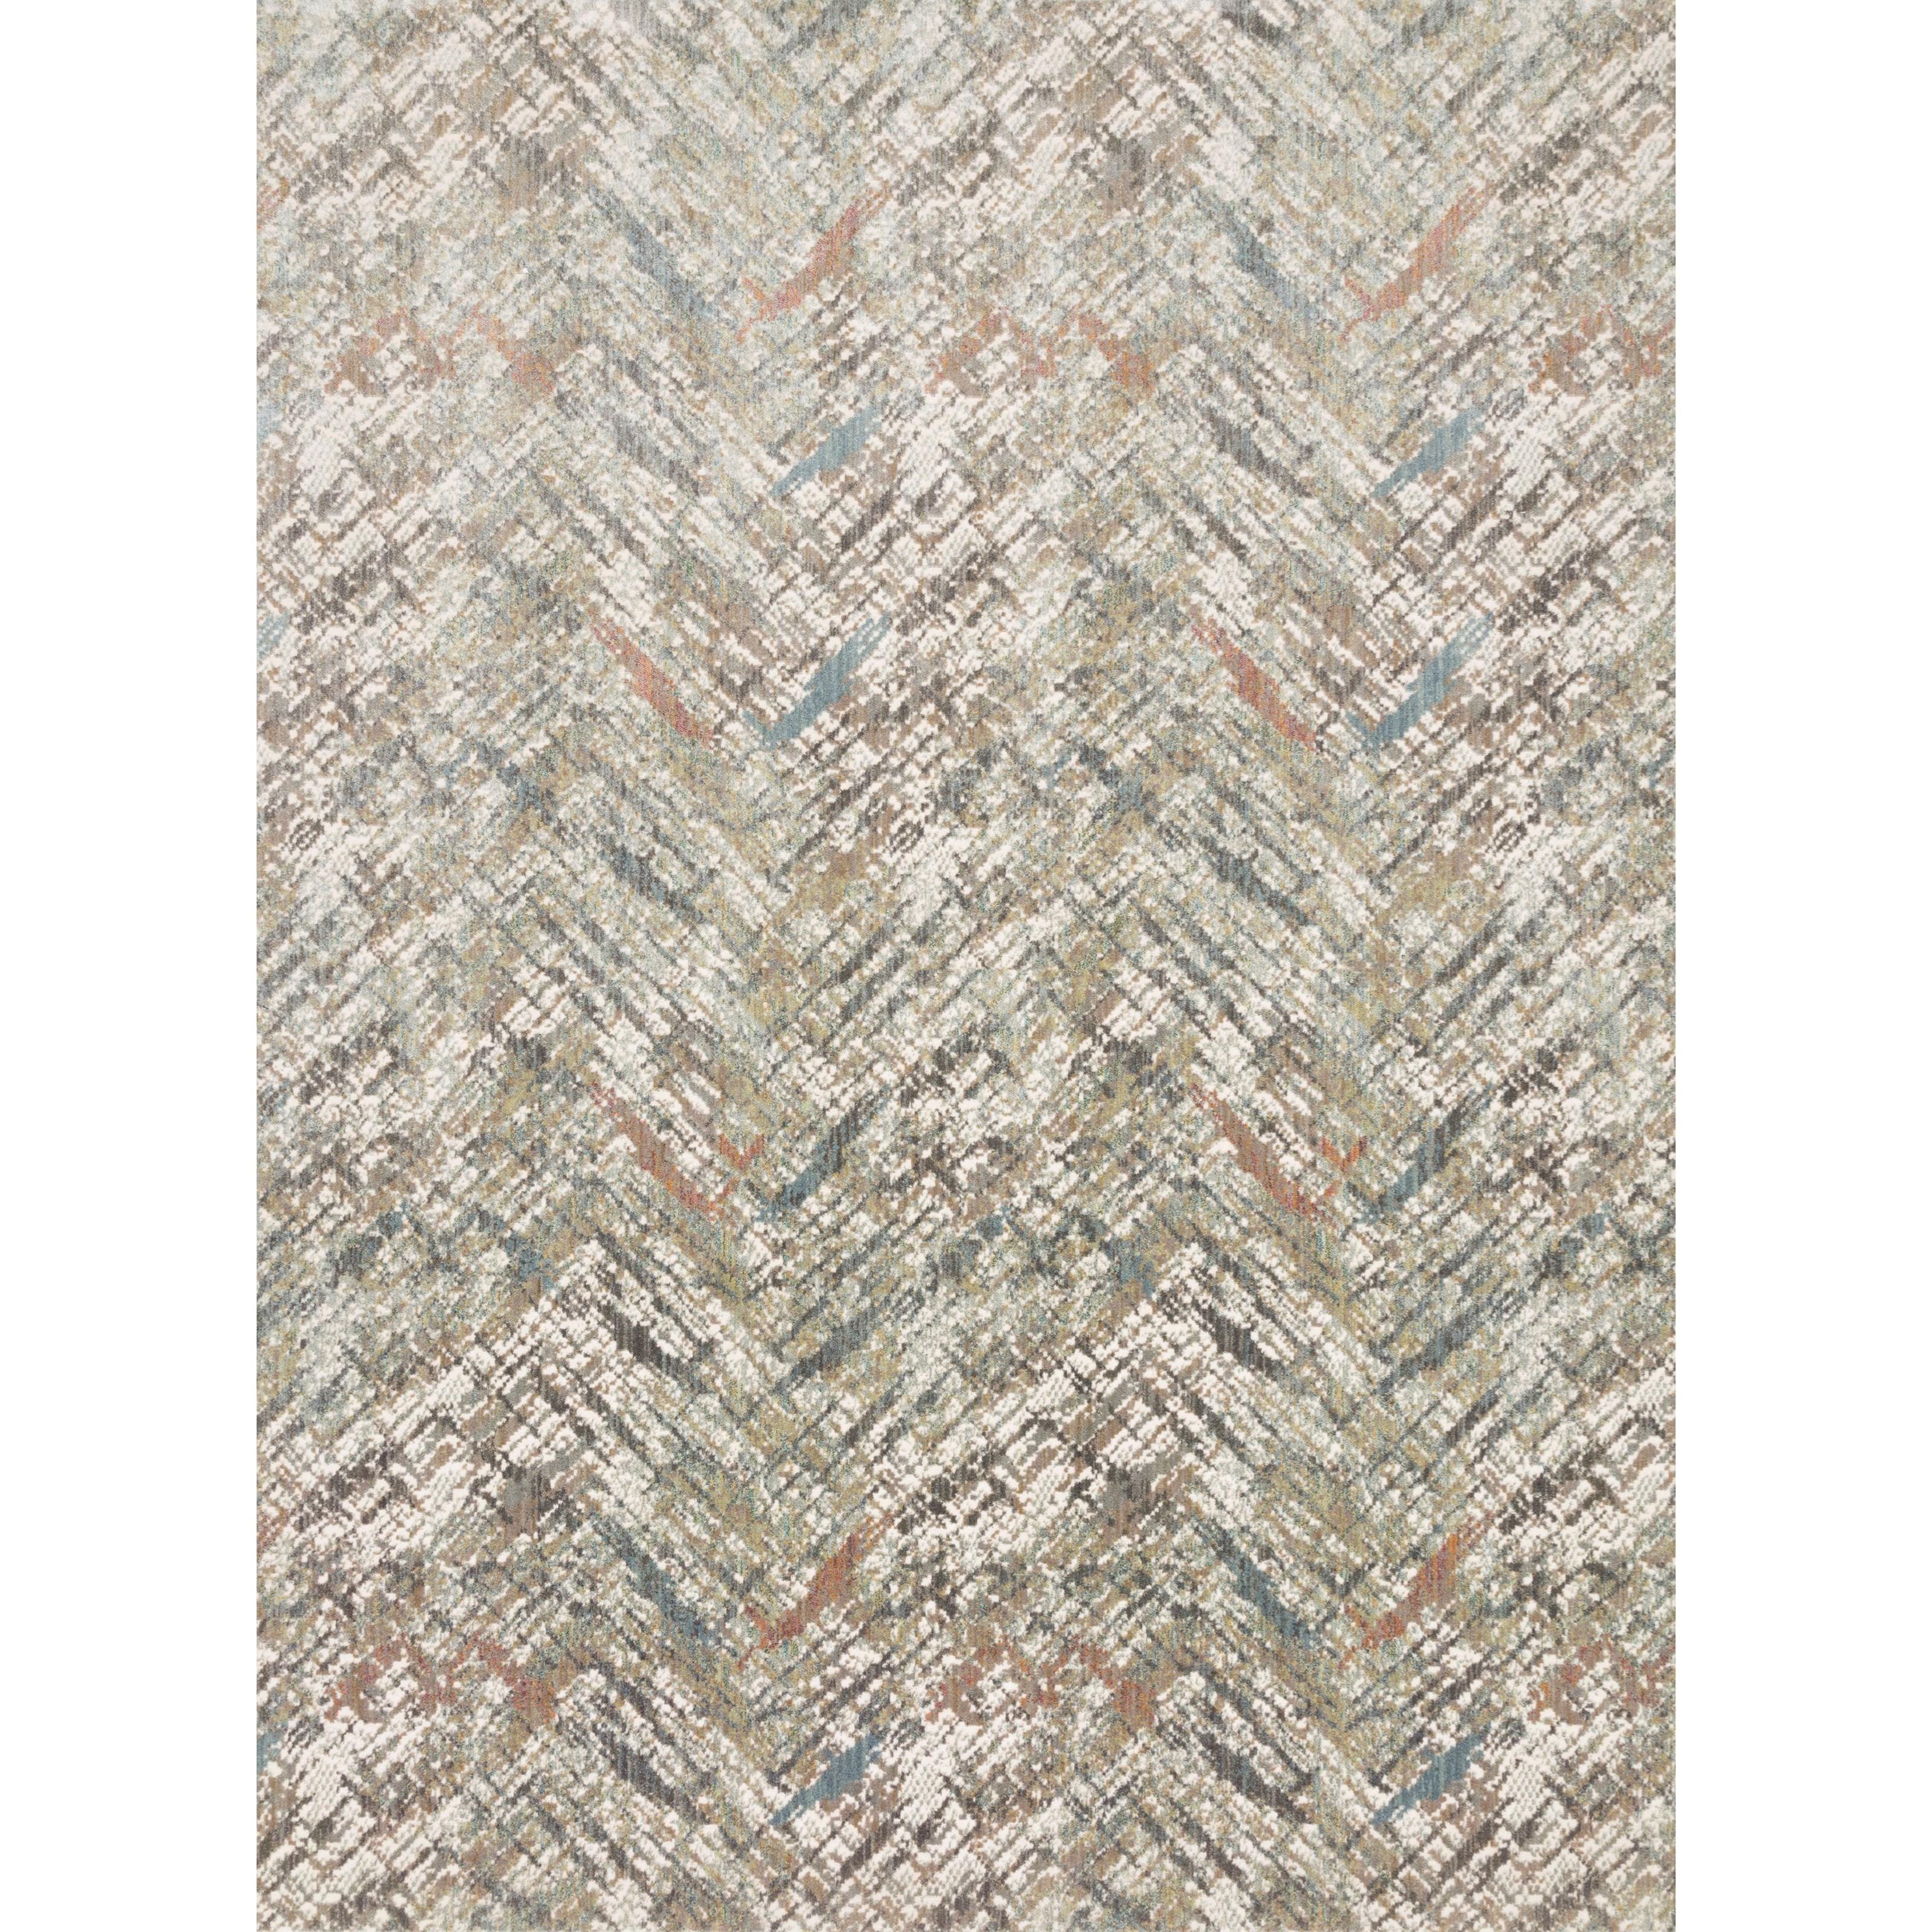 "Reid 11'6"" x 15' Morning Mist Rug by Loloi Rugs at Virginia Furniture Market"